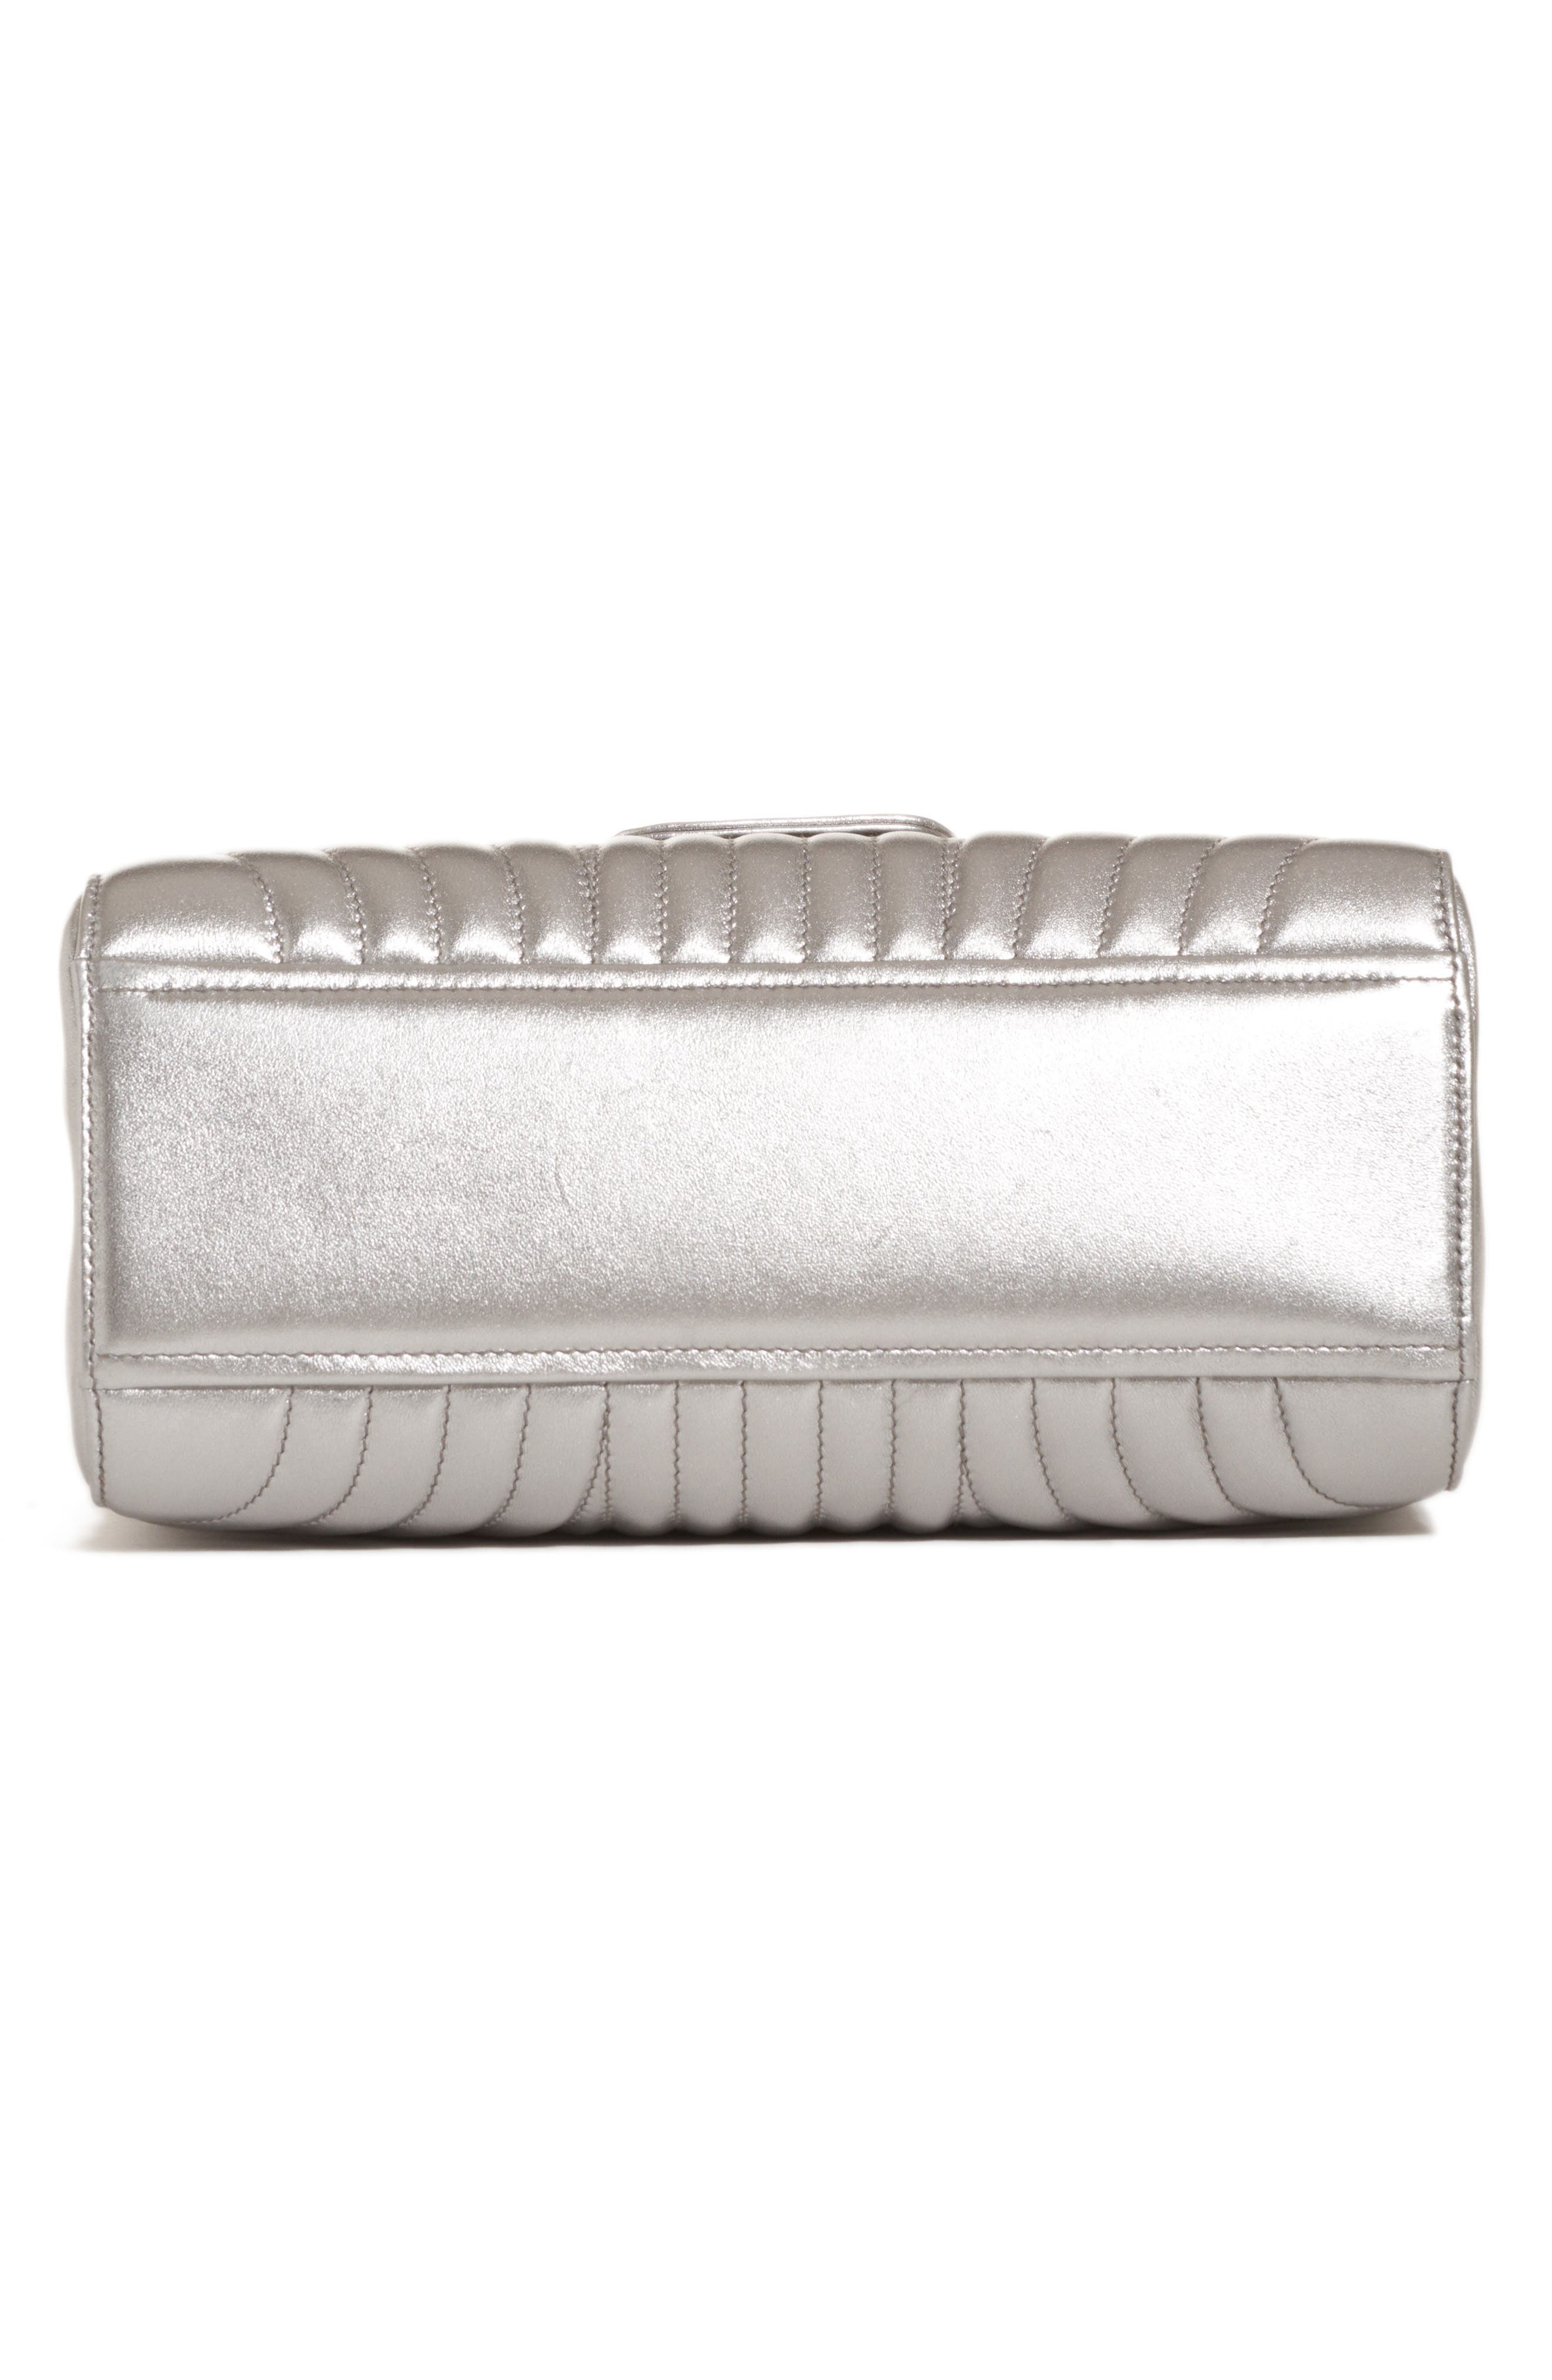 Quilted Metallic Lambskin Leather Handbag,                             Alternate thumbnail 5, color,                             CROMO